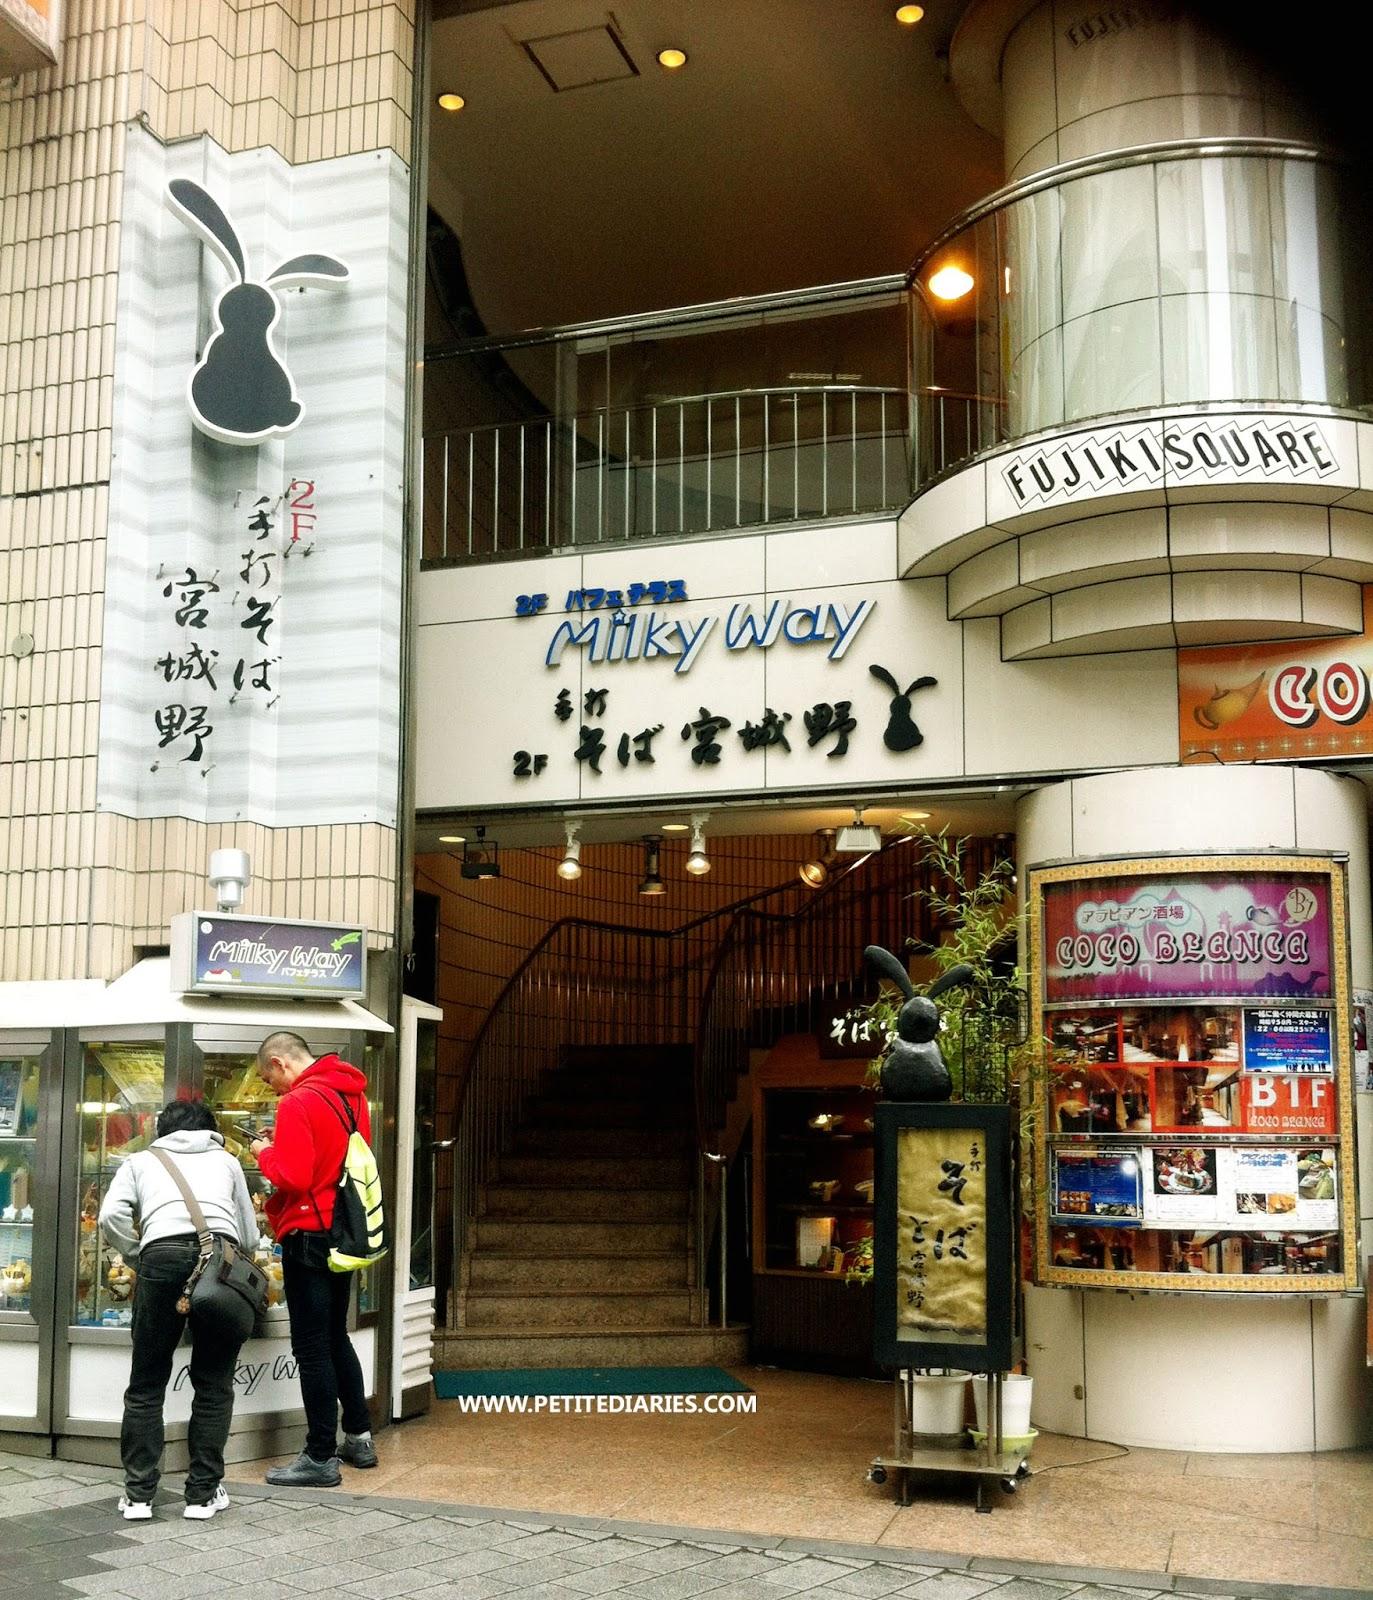 ikebukuro milkyway japan